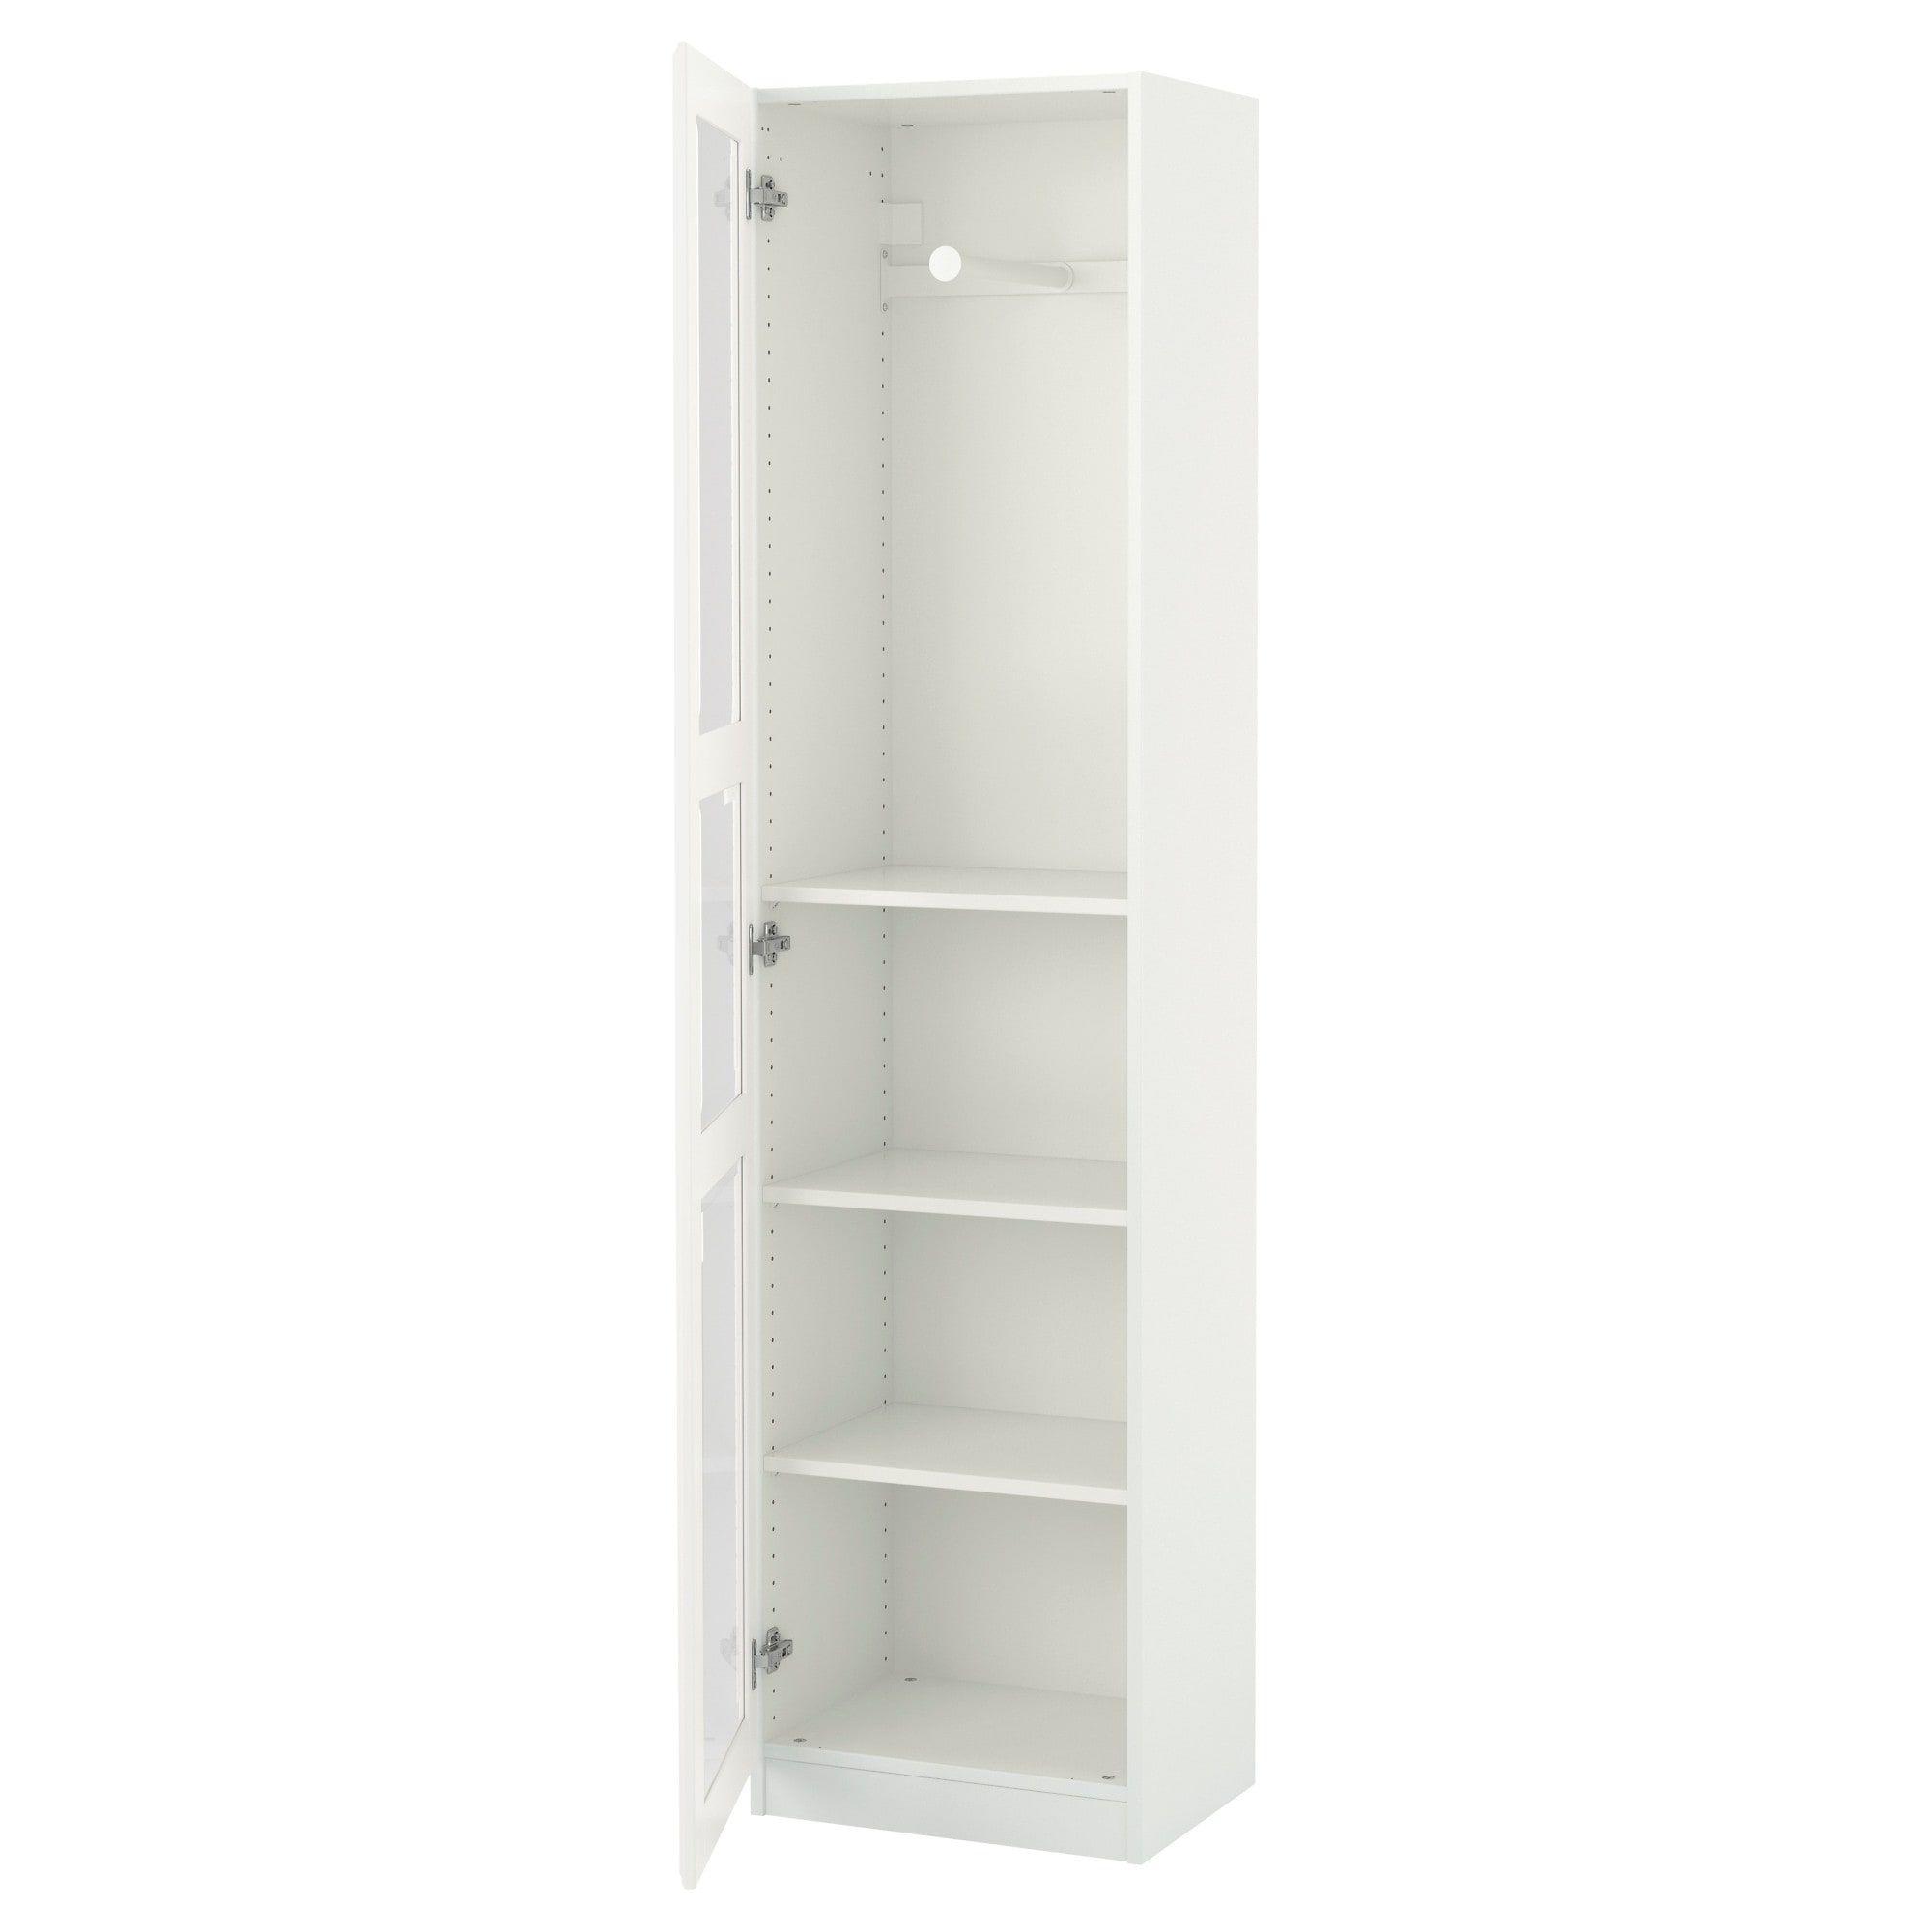 Pax wardrobe white tyssedal glass in studio space